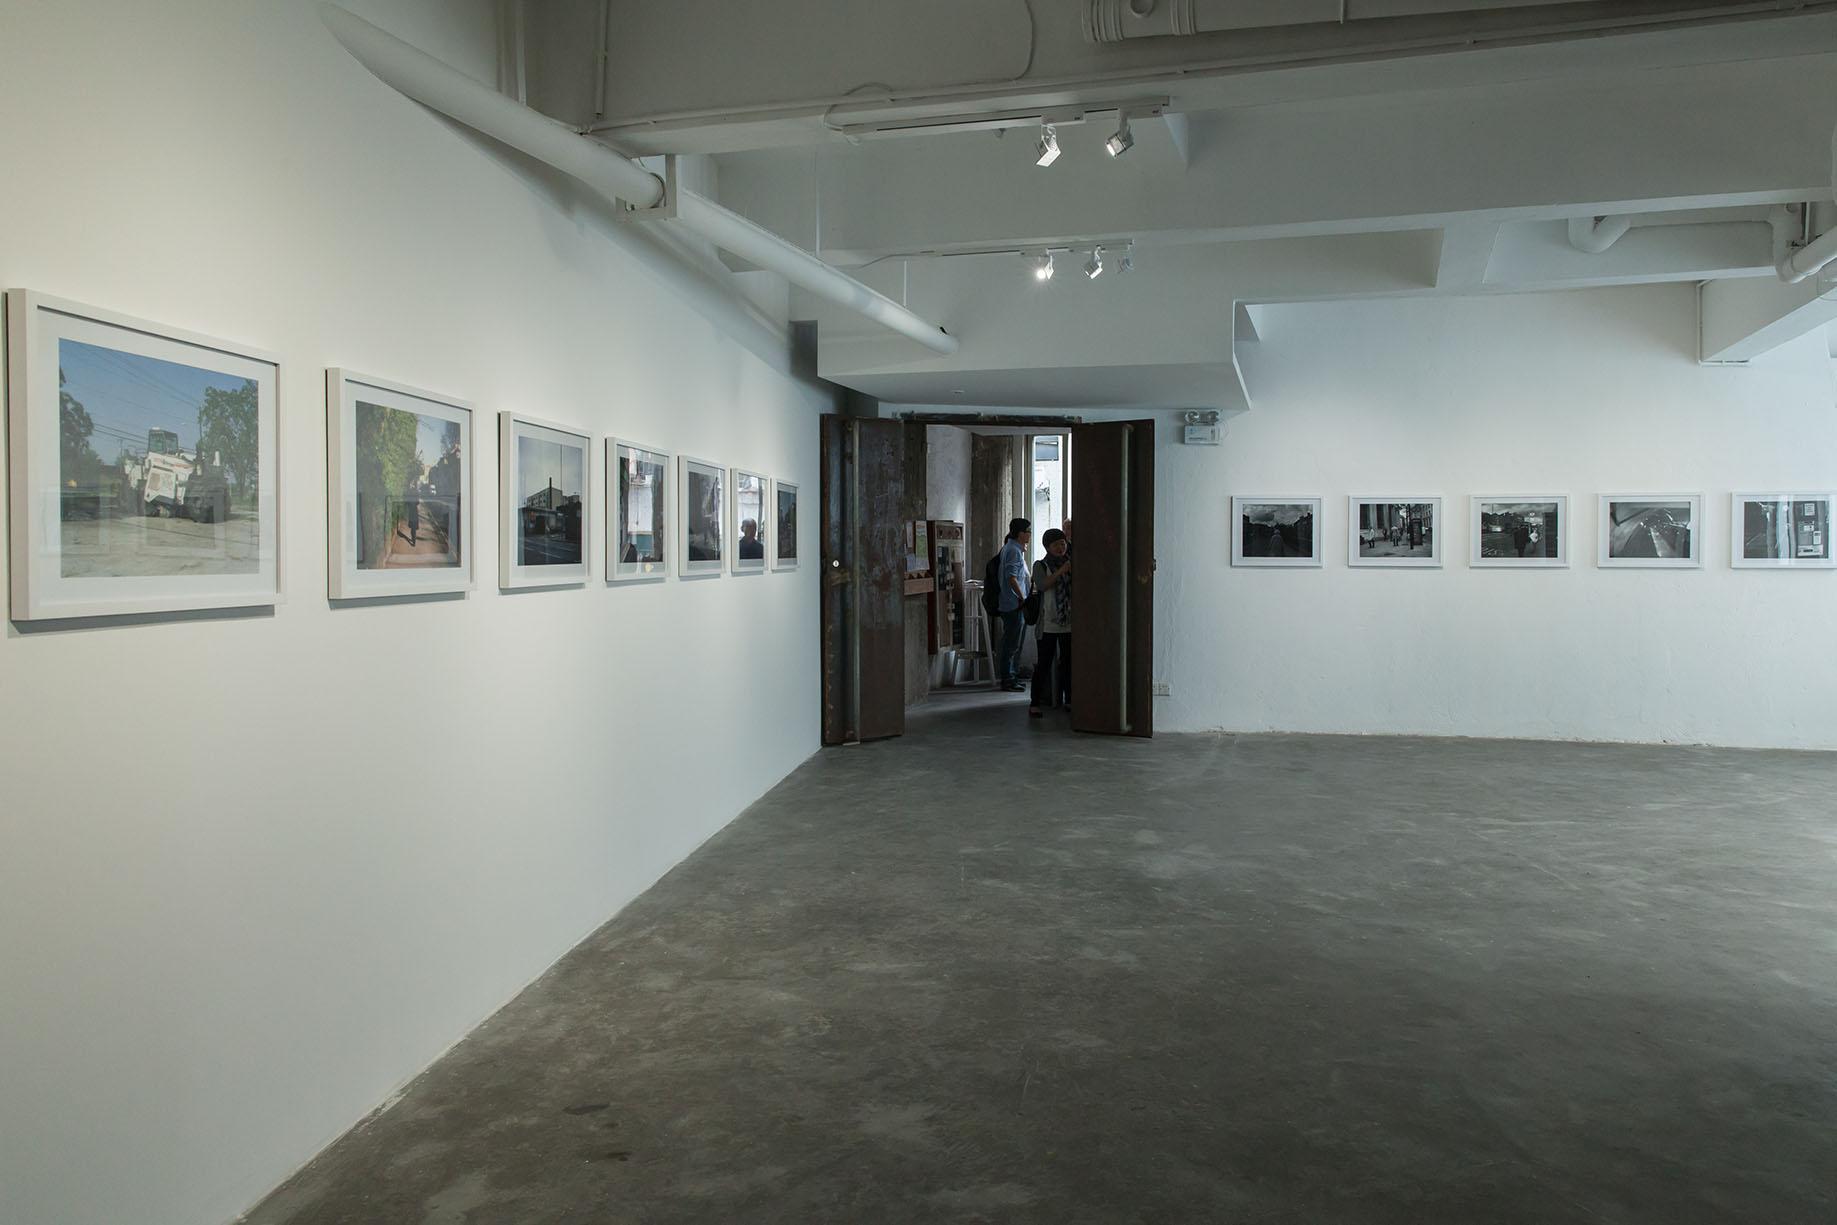 x01-展览现场 exhibition view